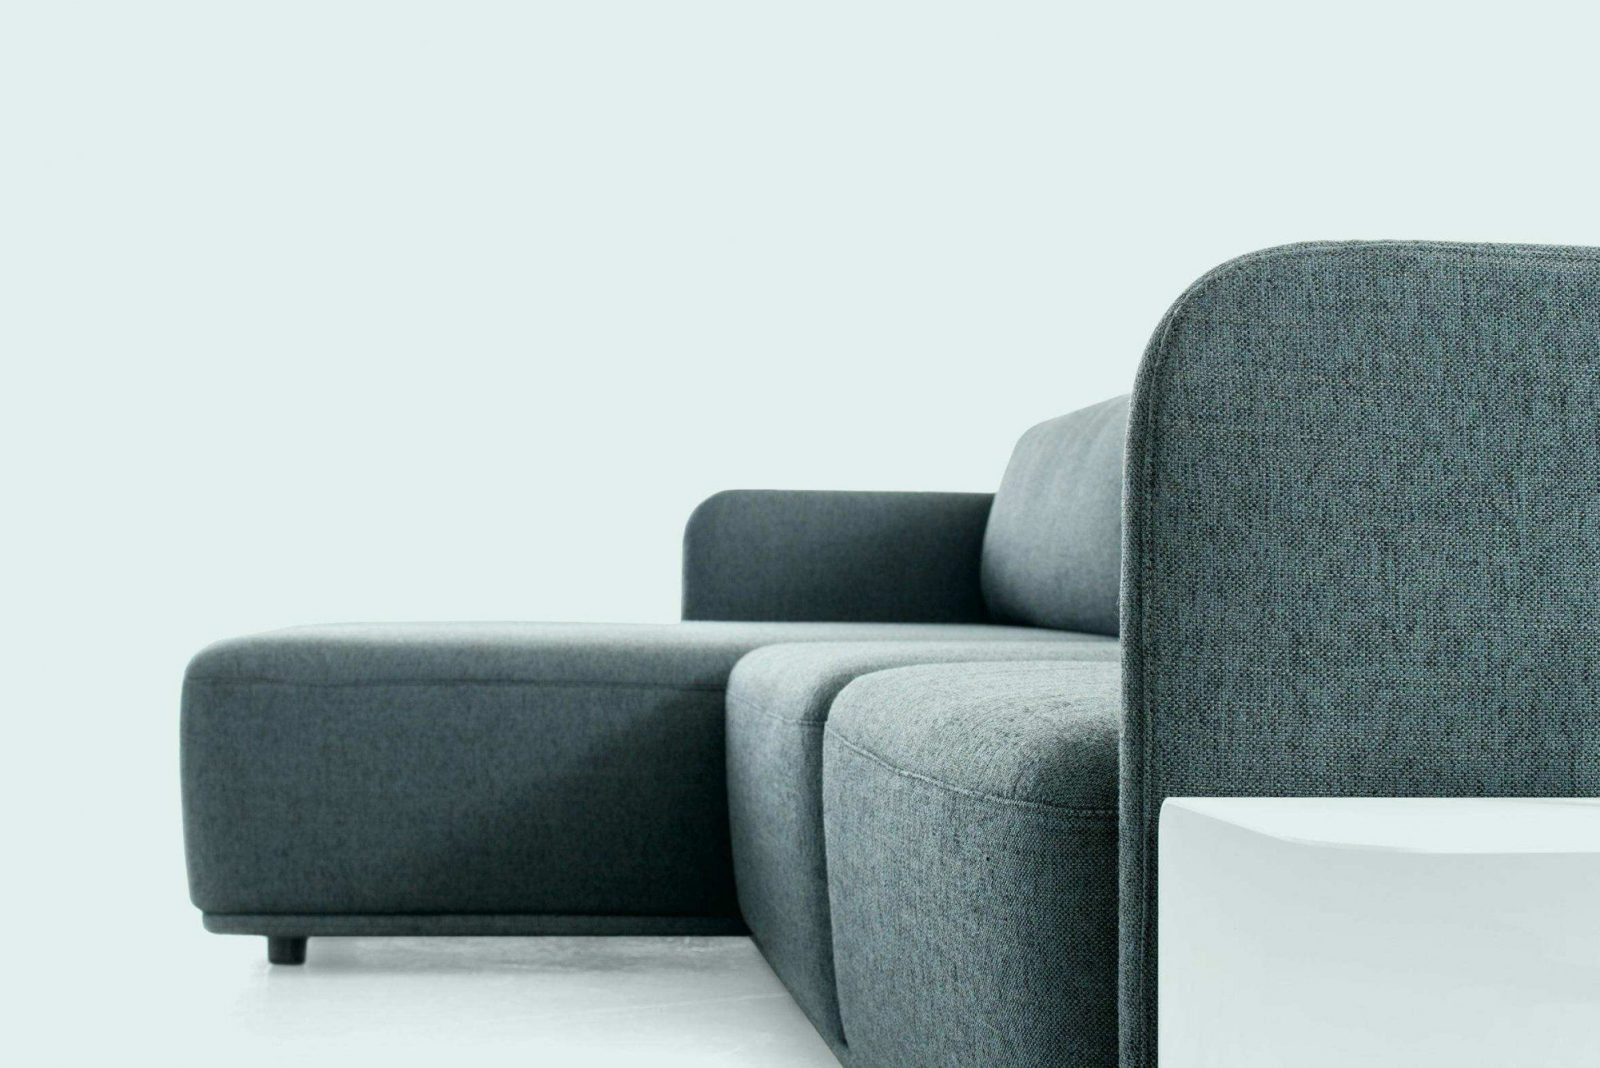 Seats And Sofas Bochum Best Of Molis Sofa Sofas From Conmoto von Seat And Sofas Bochum Bild